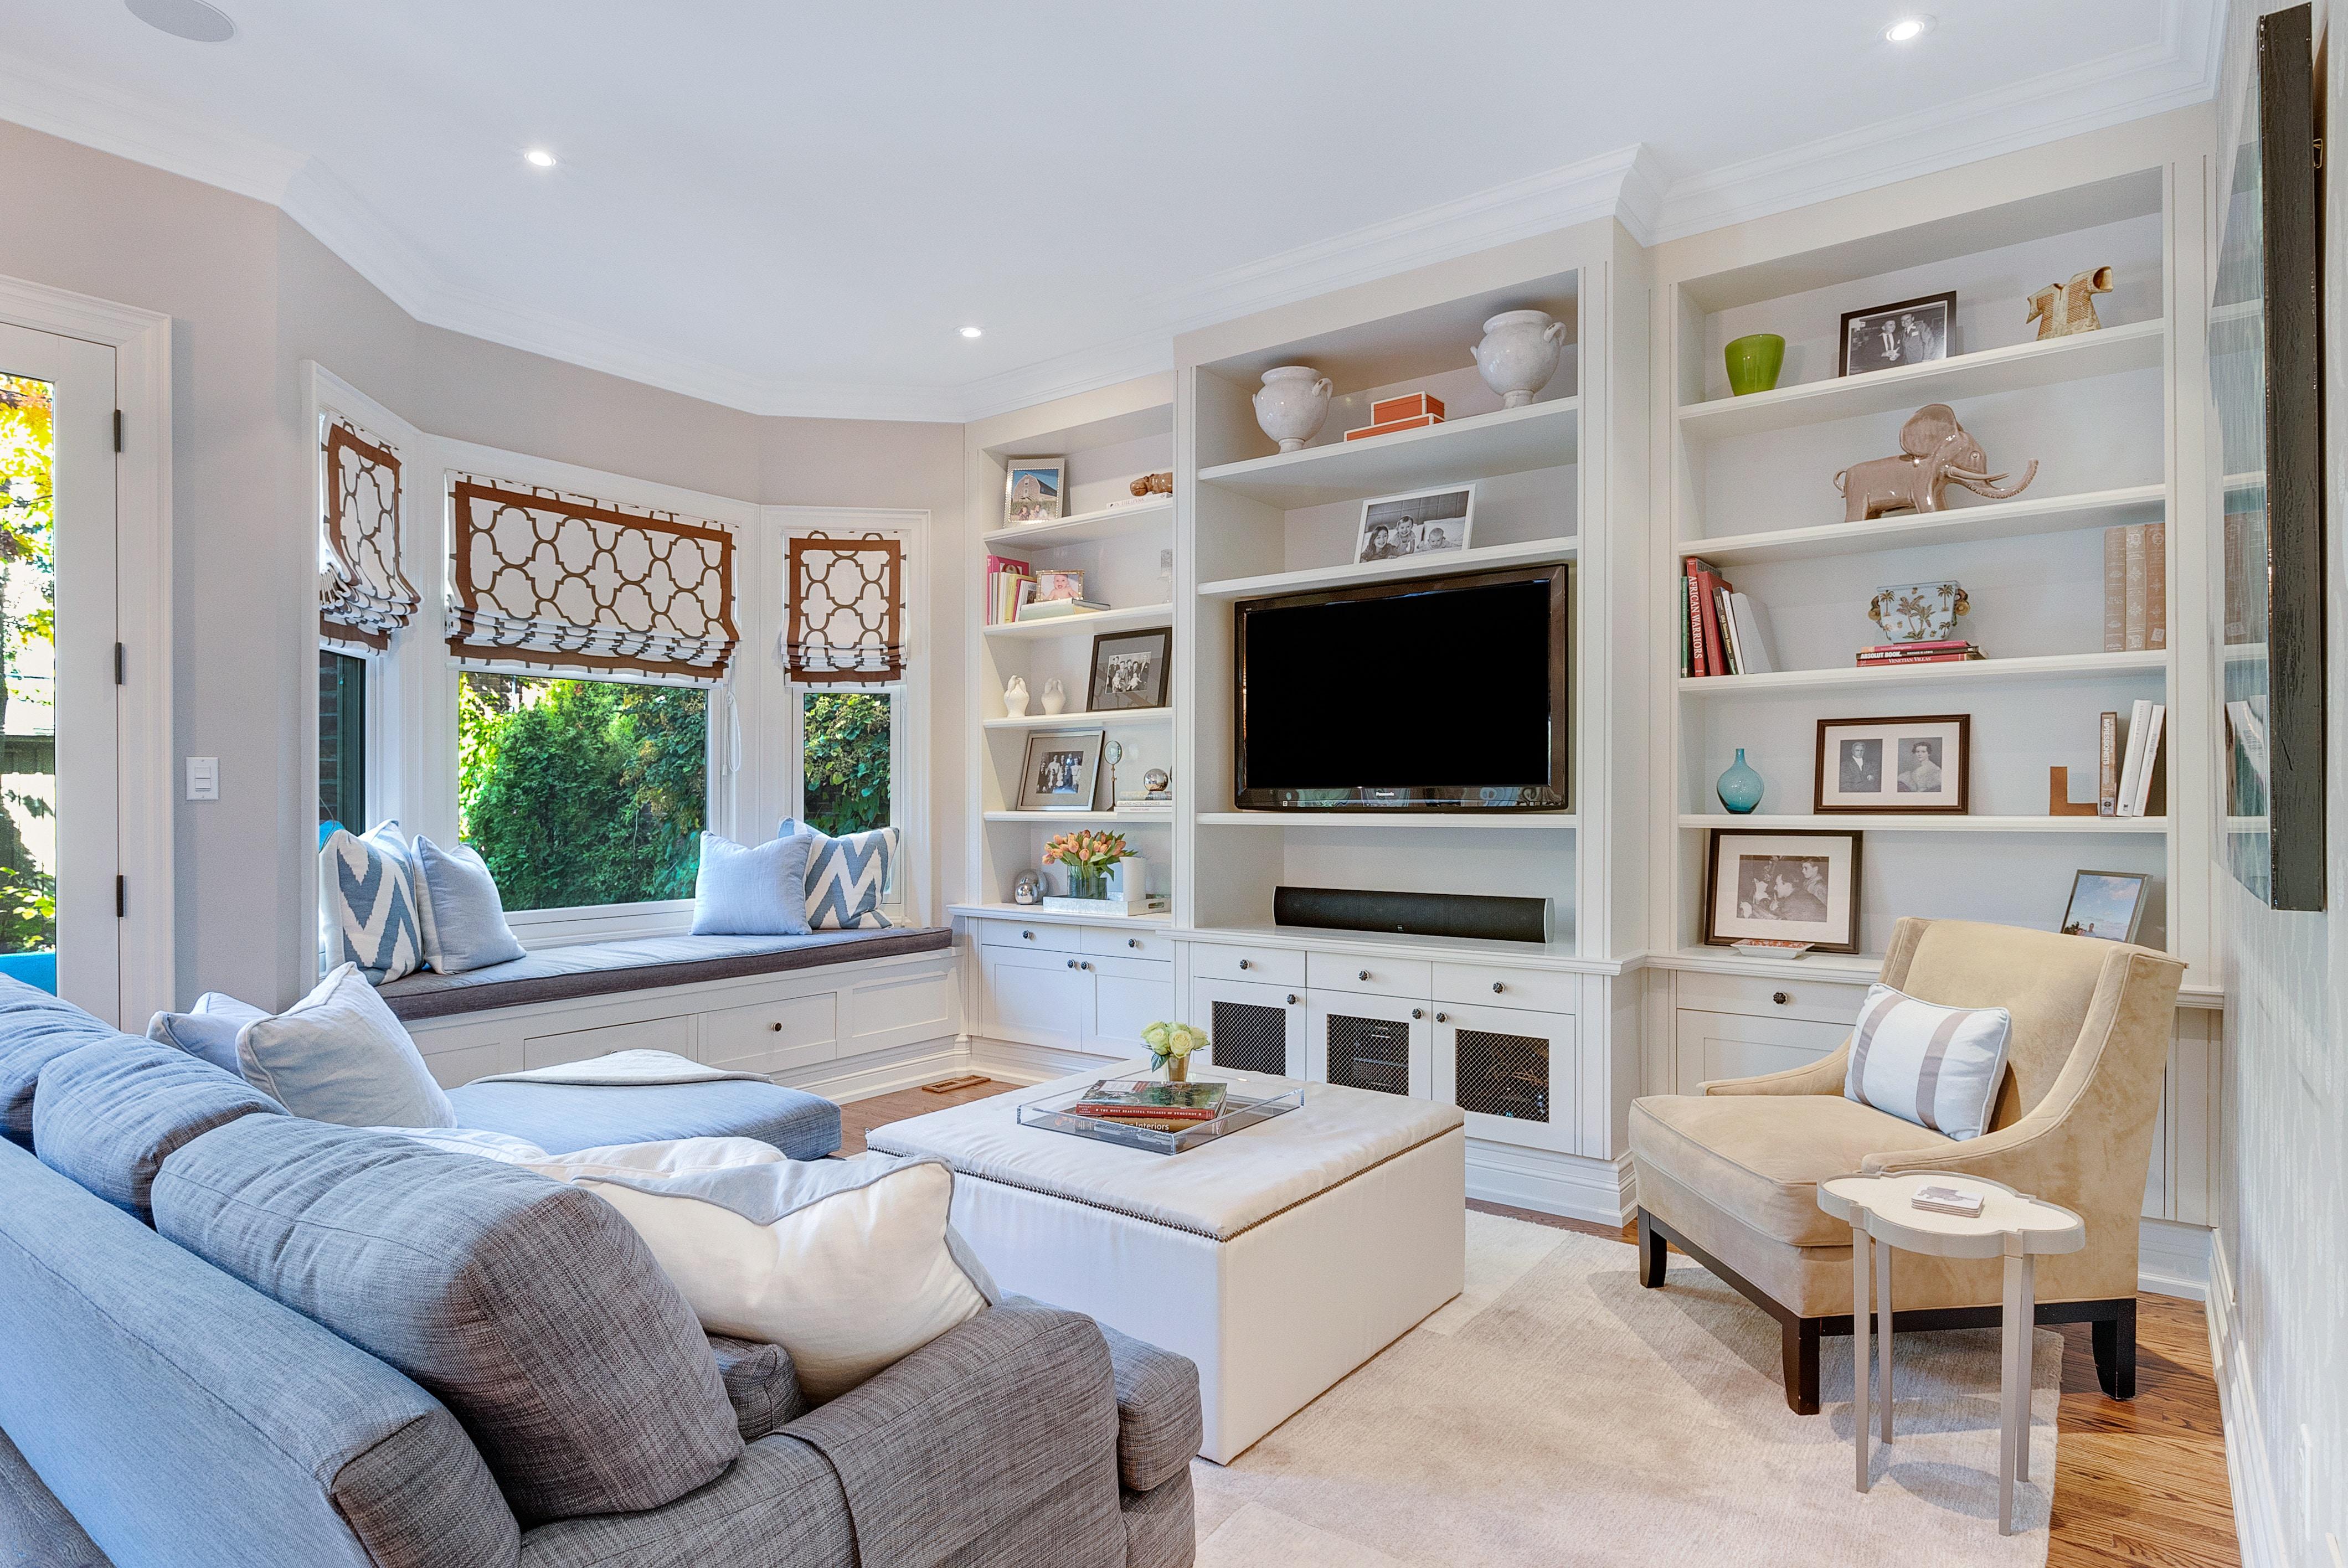 5 Living Room Ideas Design to Lightened-Up Summer